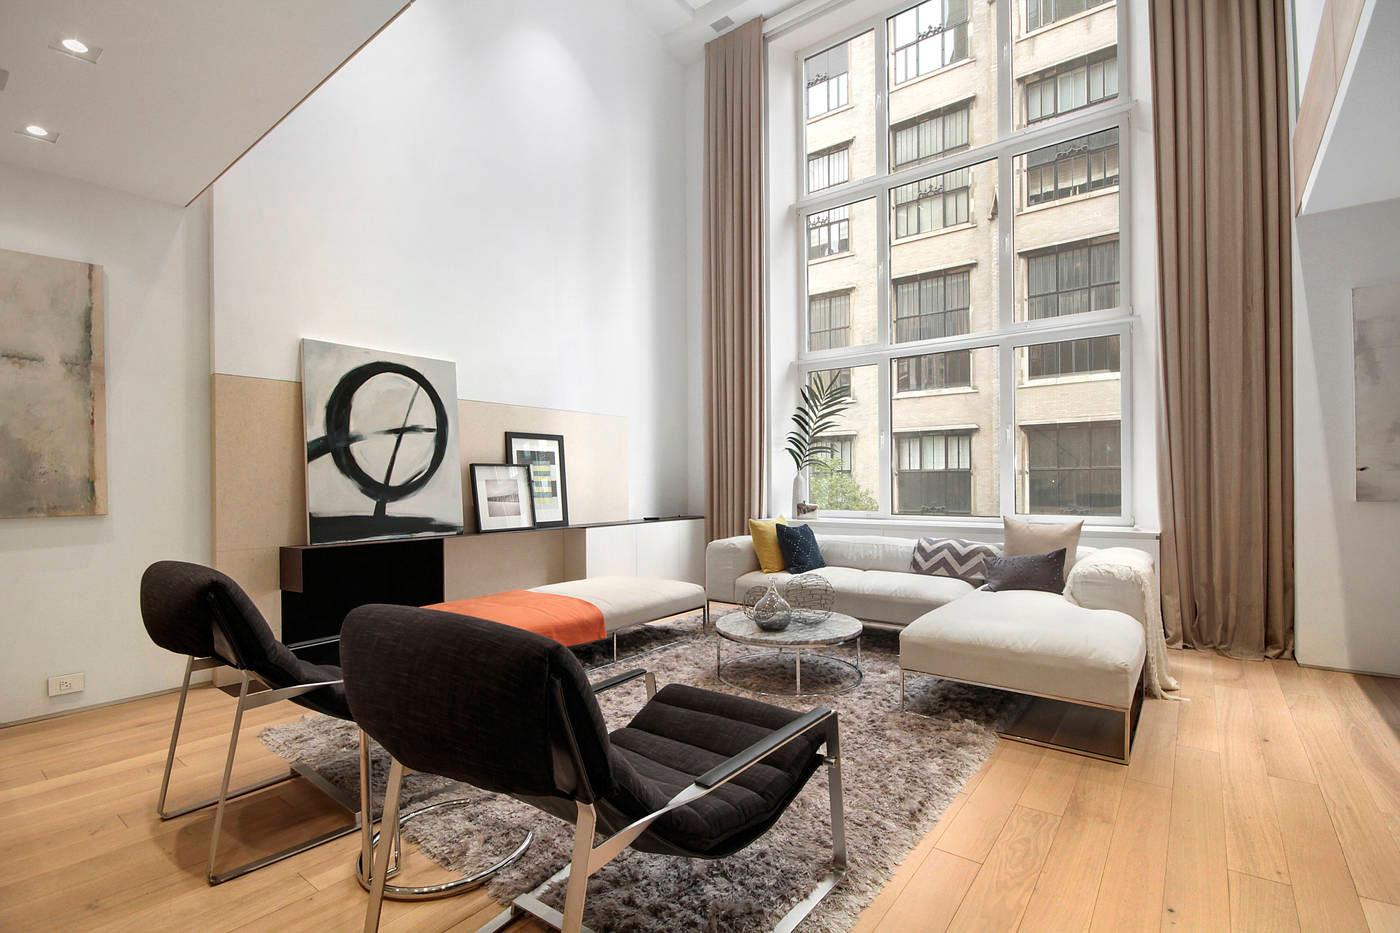 1916 Central Park West Apartment Remodeled by Workshop APD-03